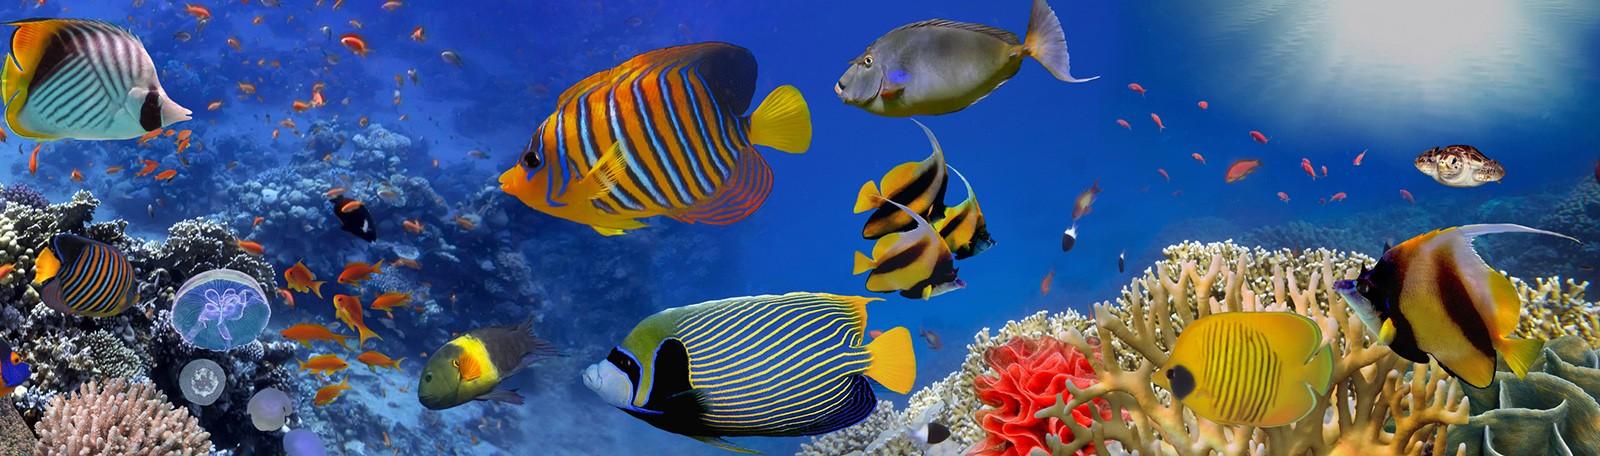 Stationner à Boulogne-sur-Mer Nausicaa Aquarium